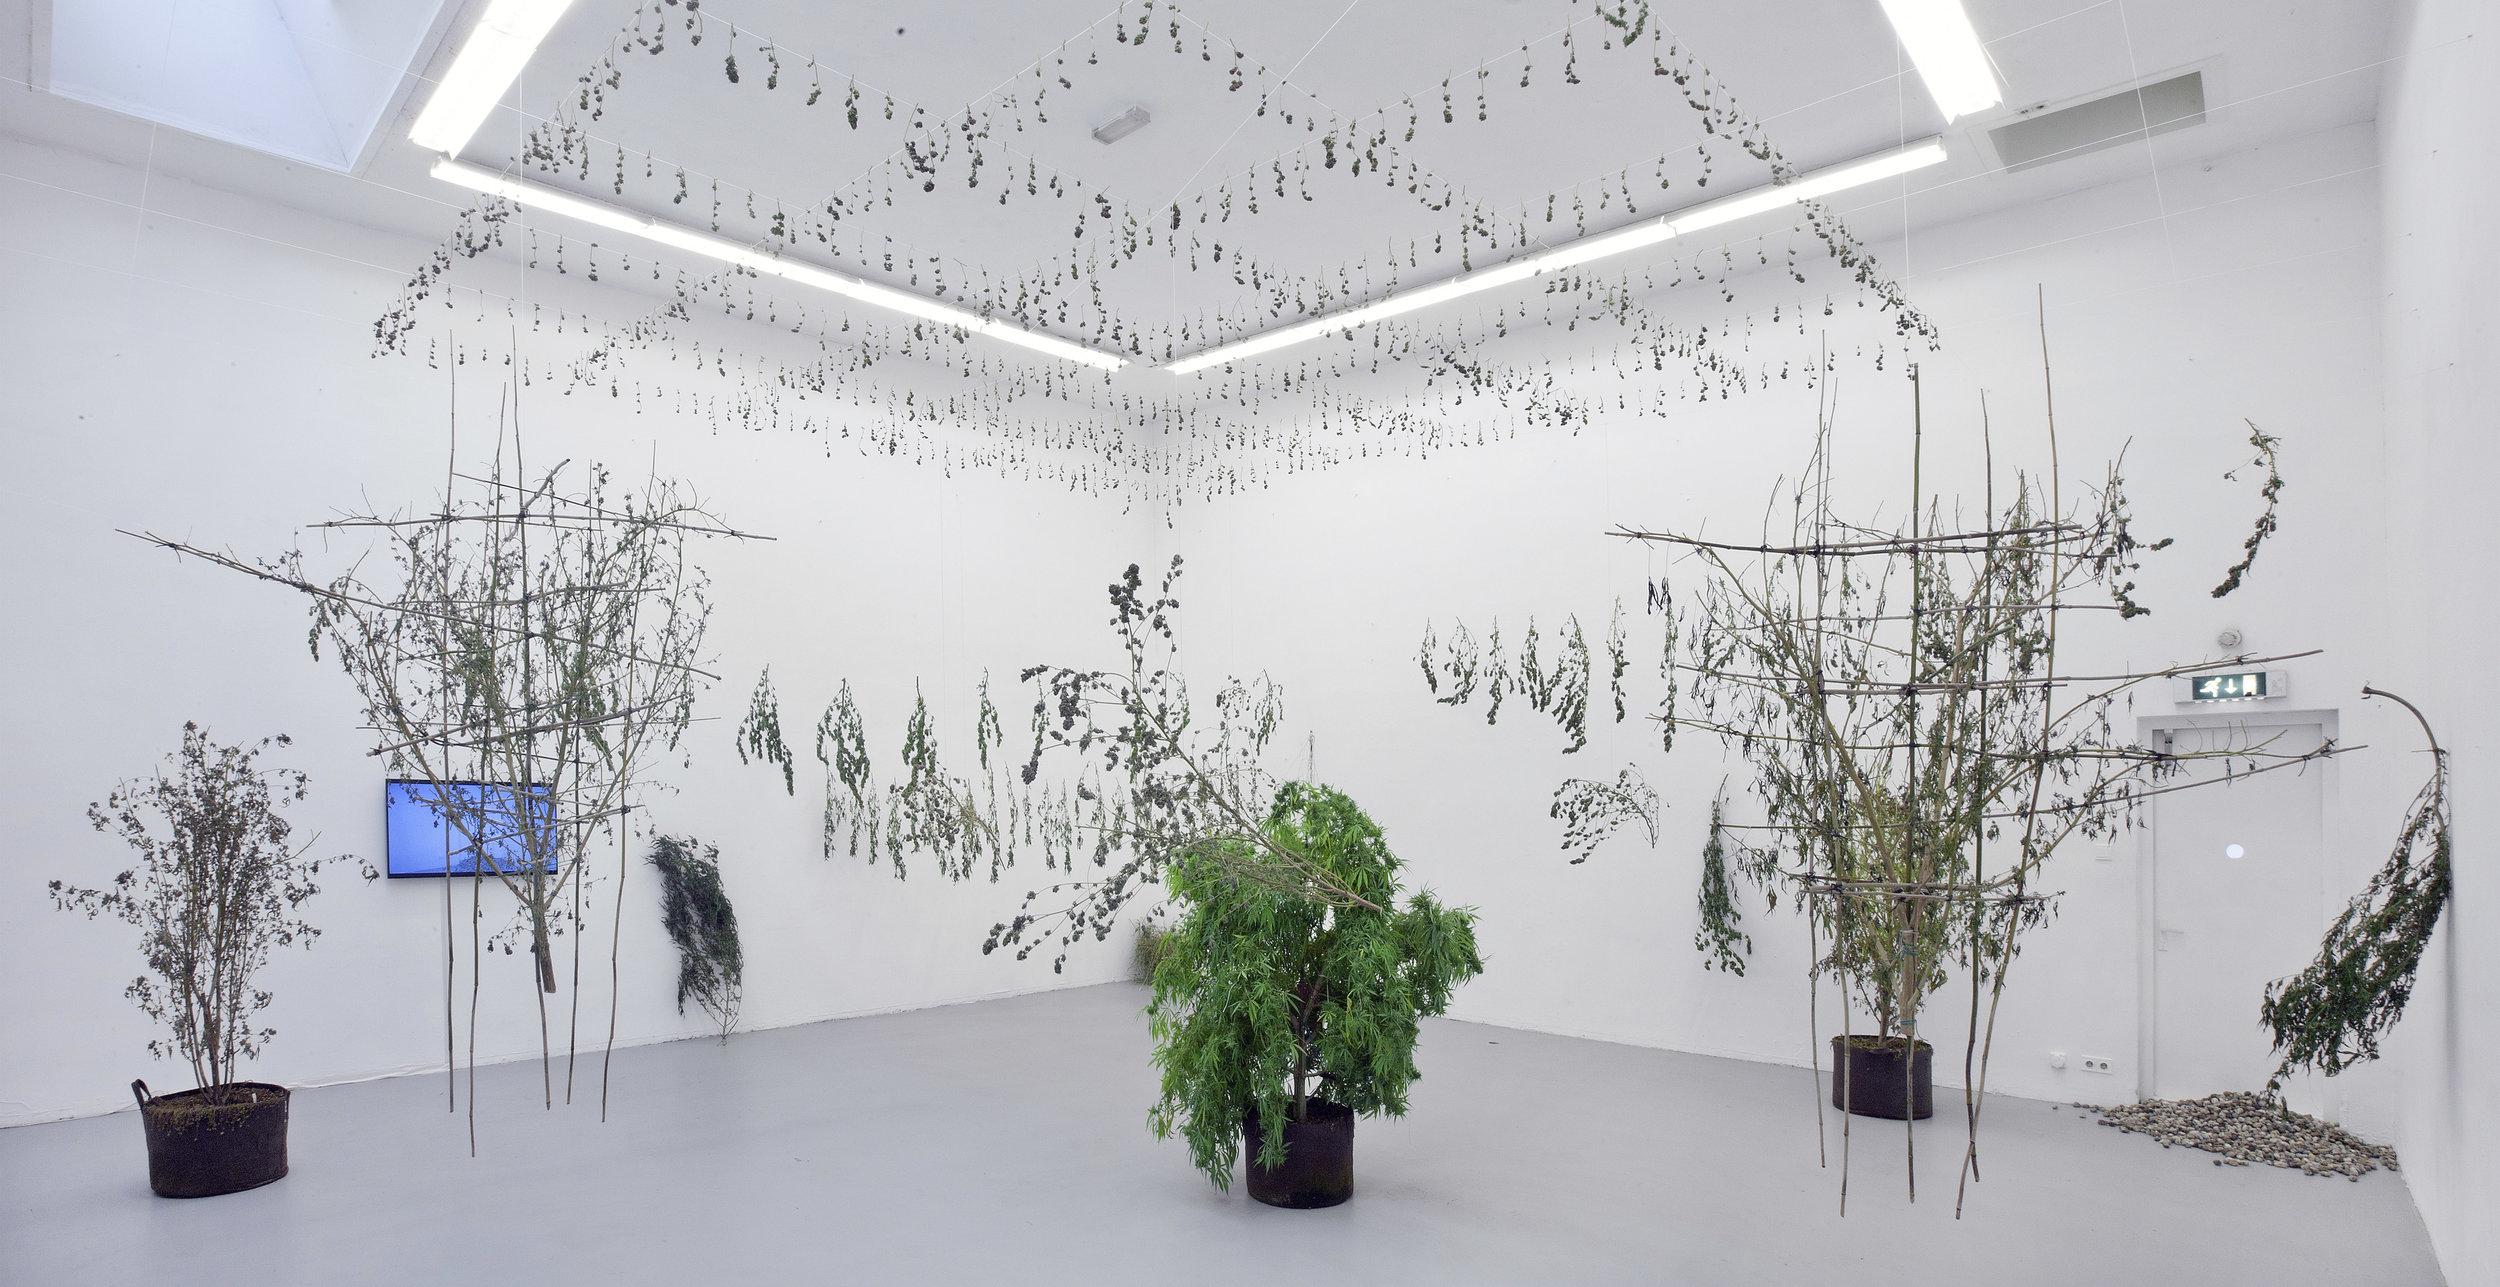 Lungs of Flowers   Rijksakademie, 2018